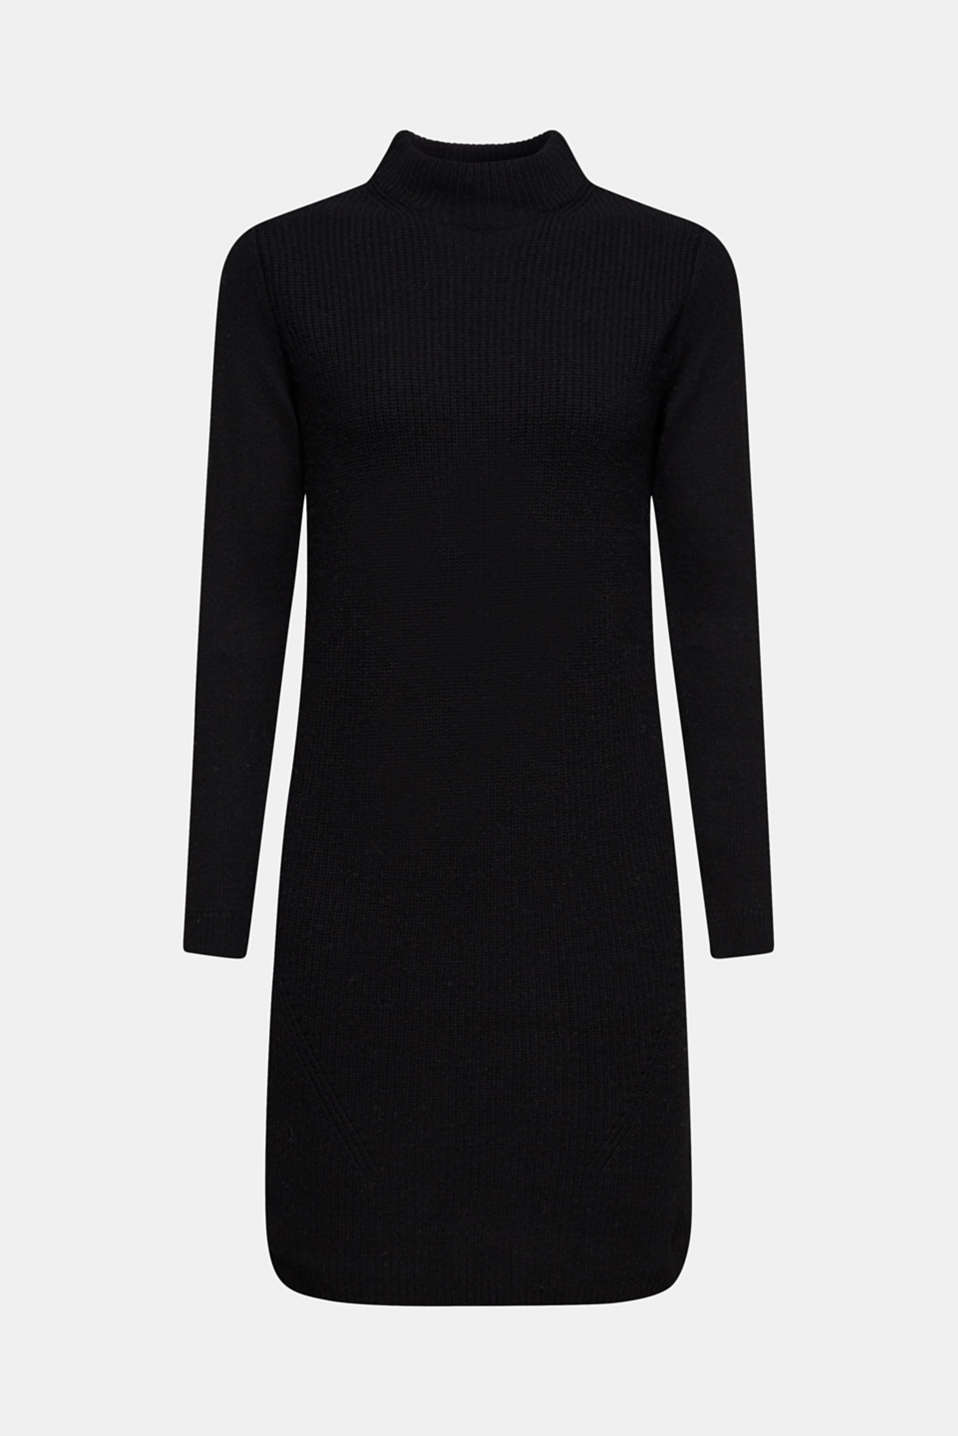 Dresses flat knitted, BLACK, detail image number 6